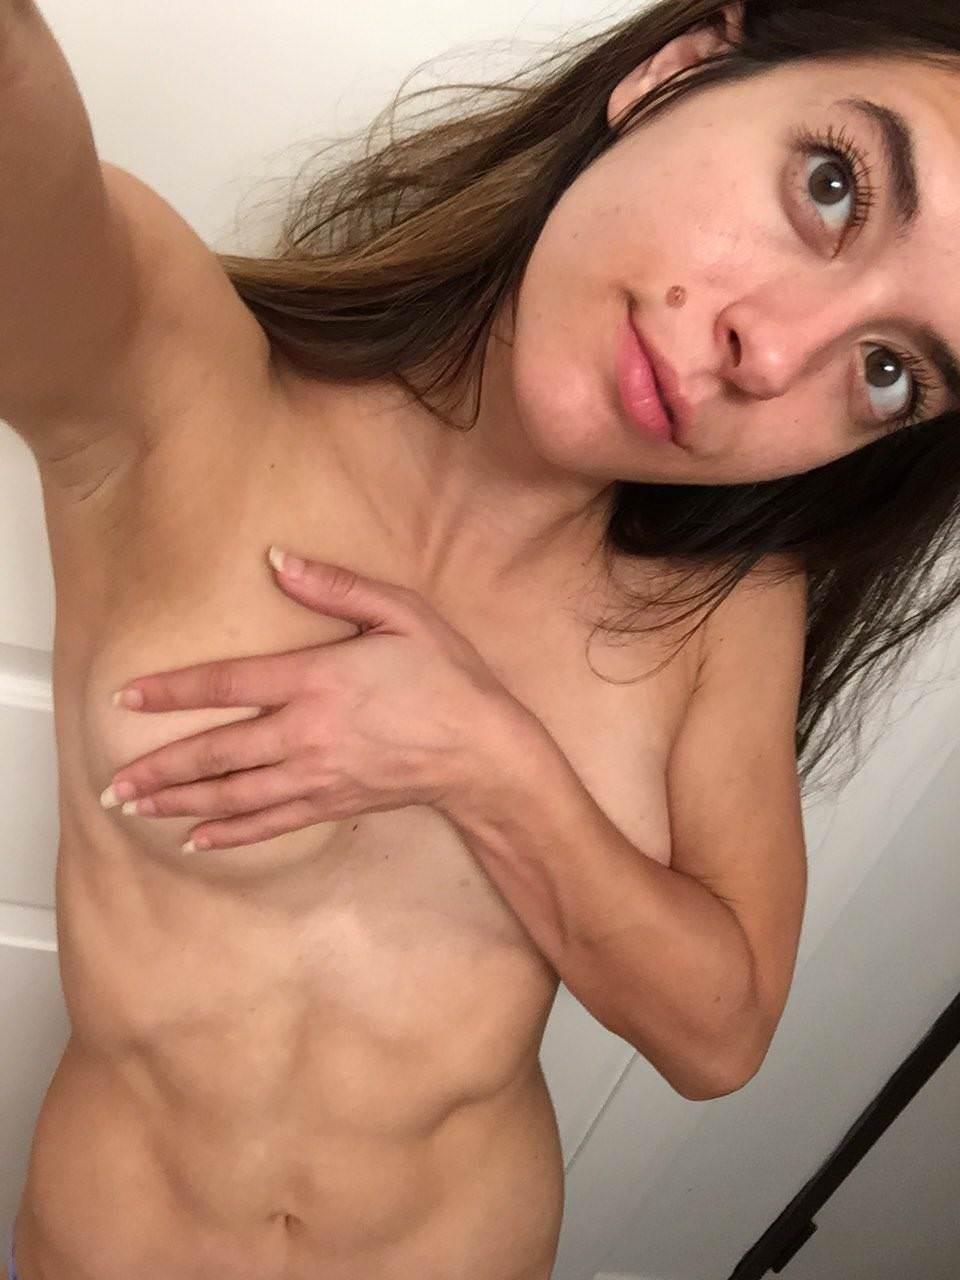 FitNakedGirls.com Abbie Maley nude 5